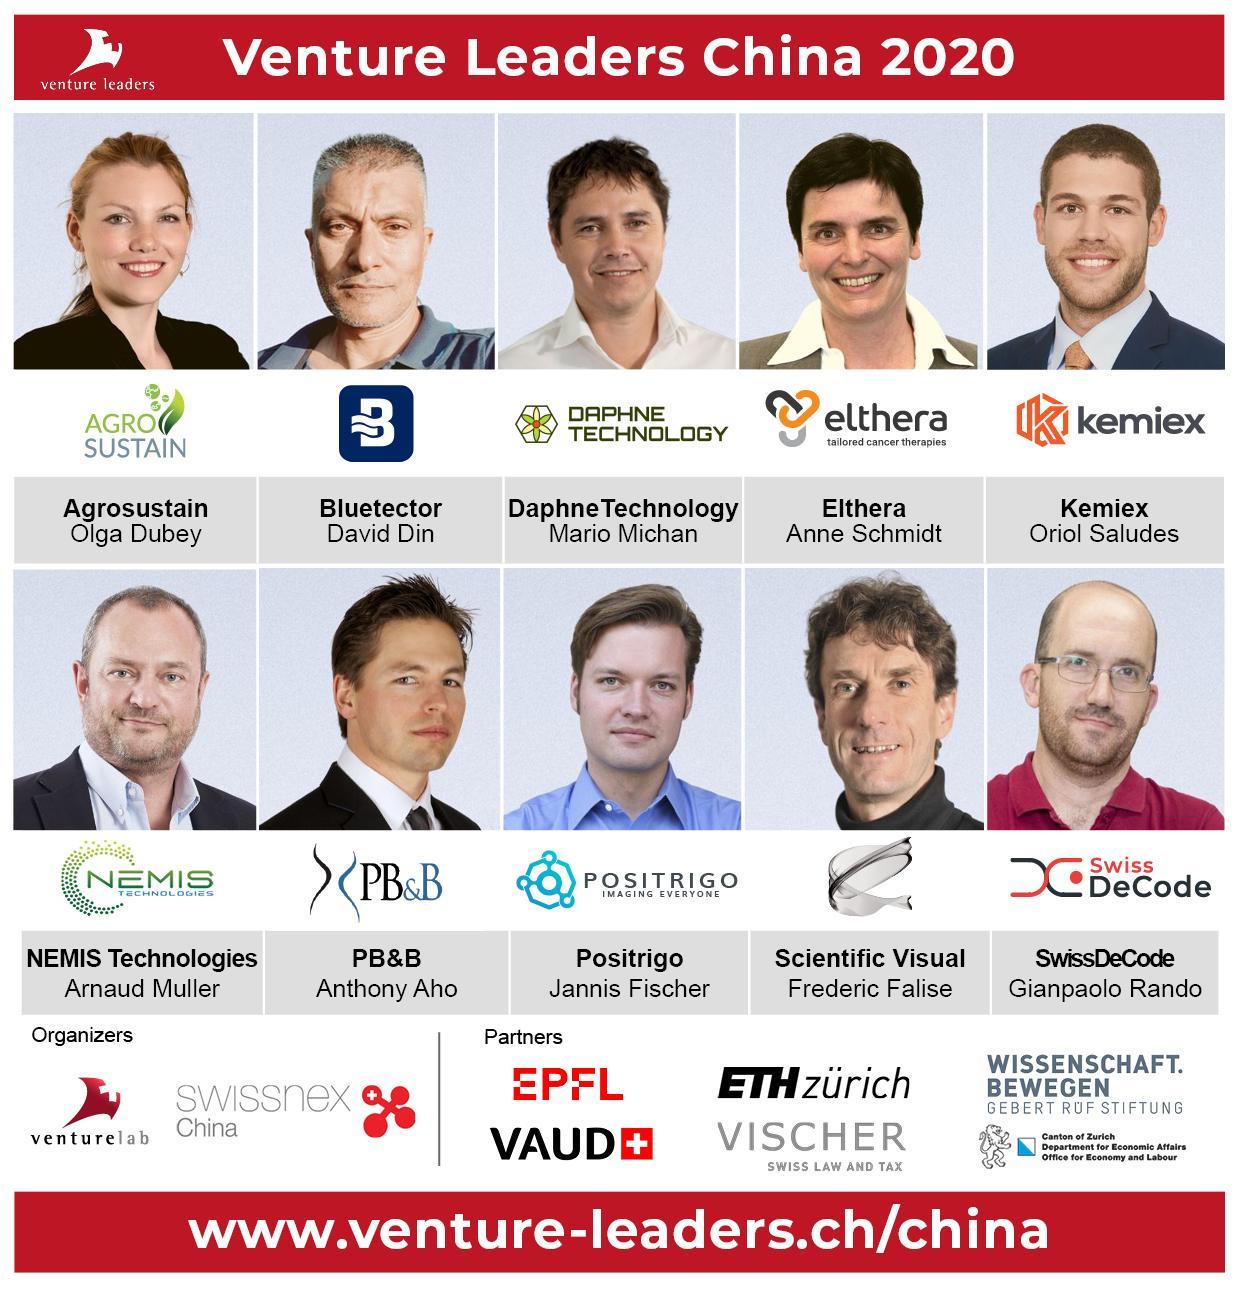 Meet the Venture Leaders China 2020